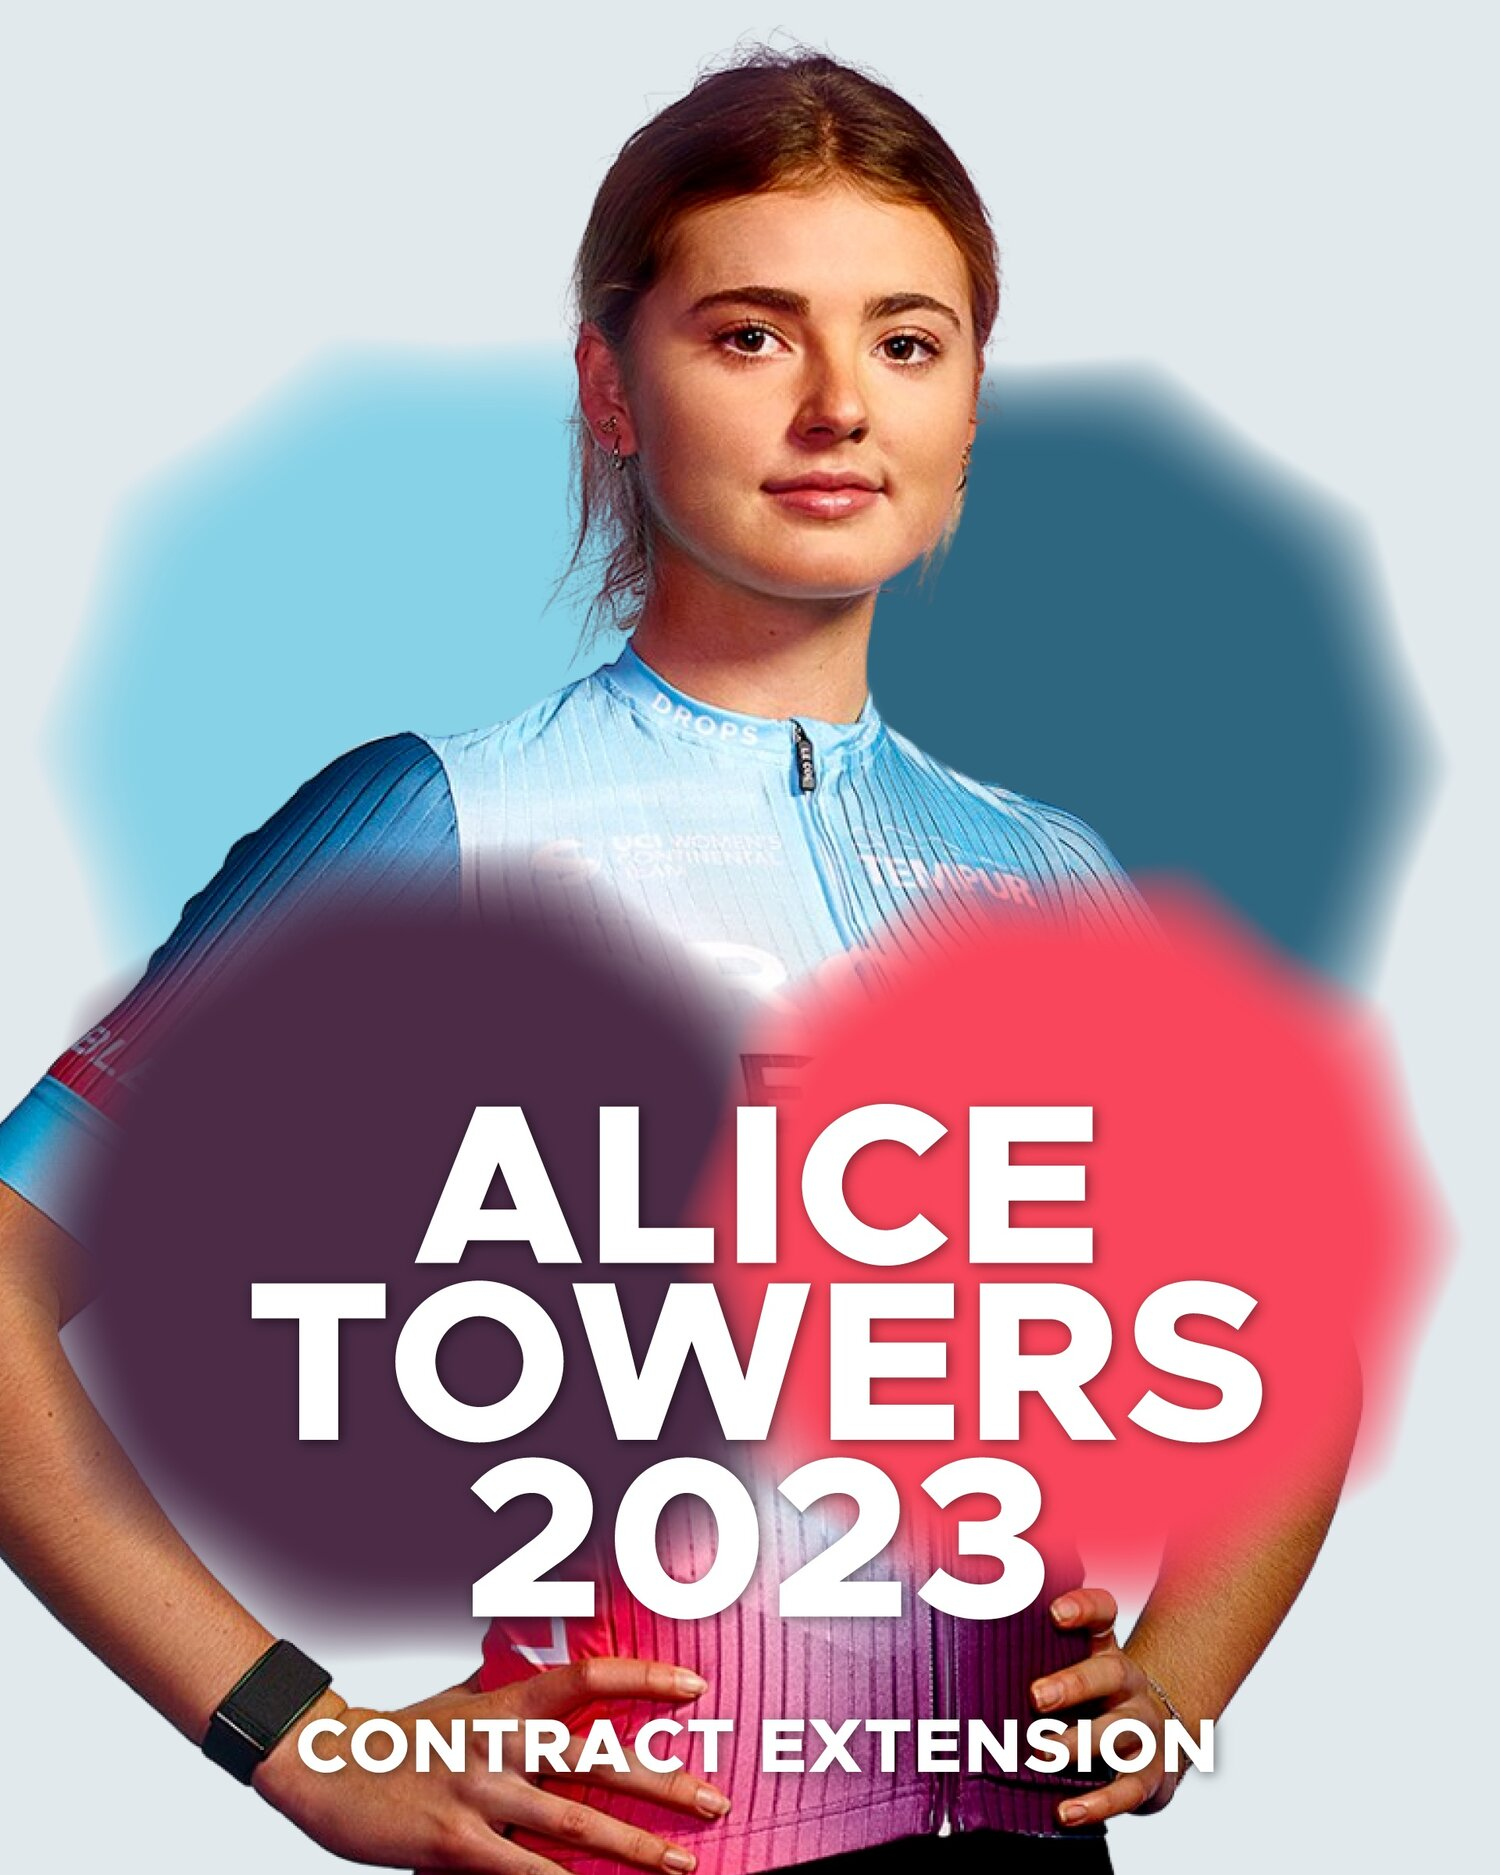 Alice Towers renews until 2023